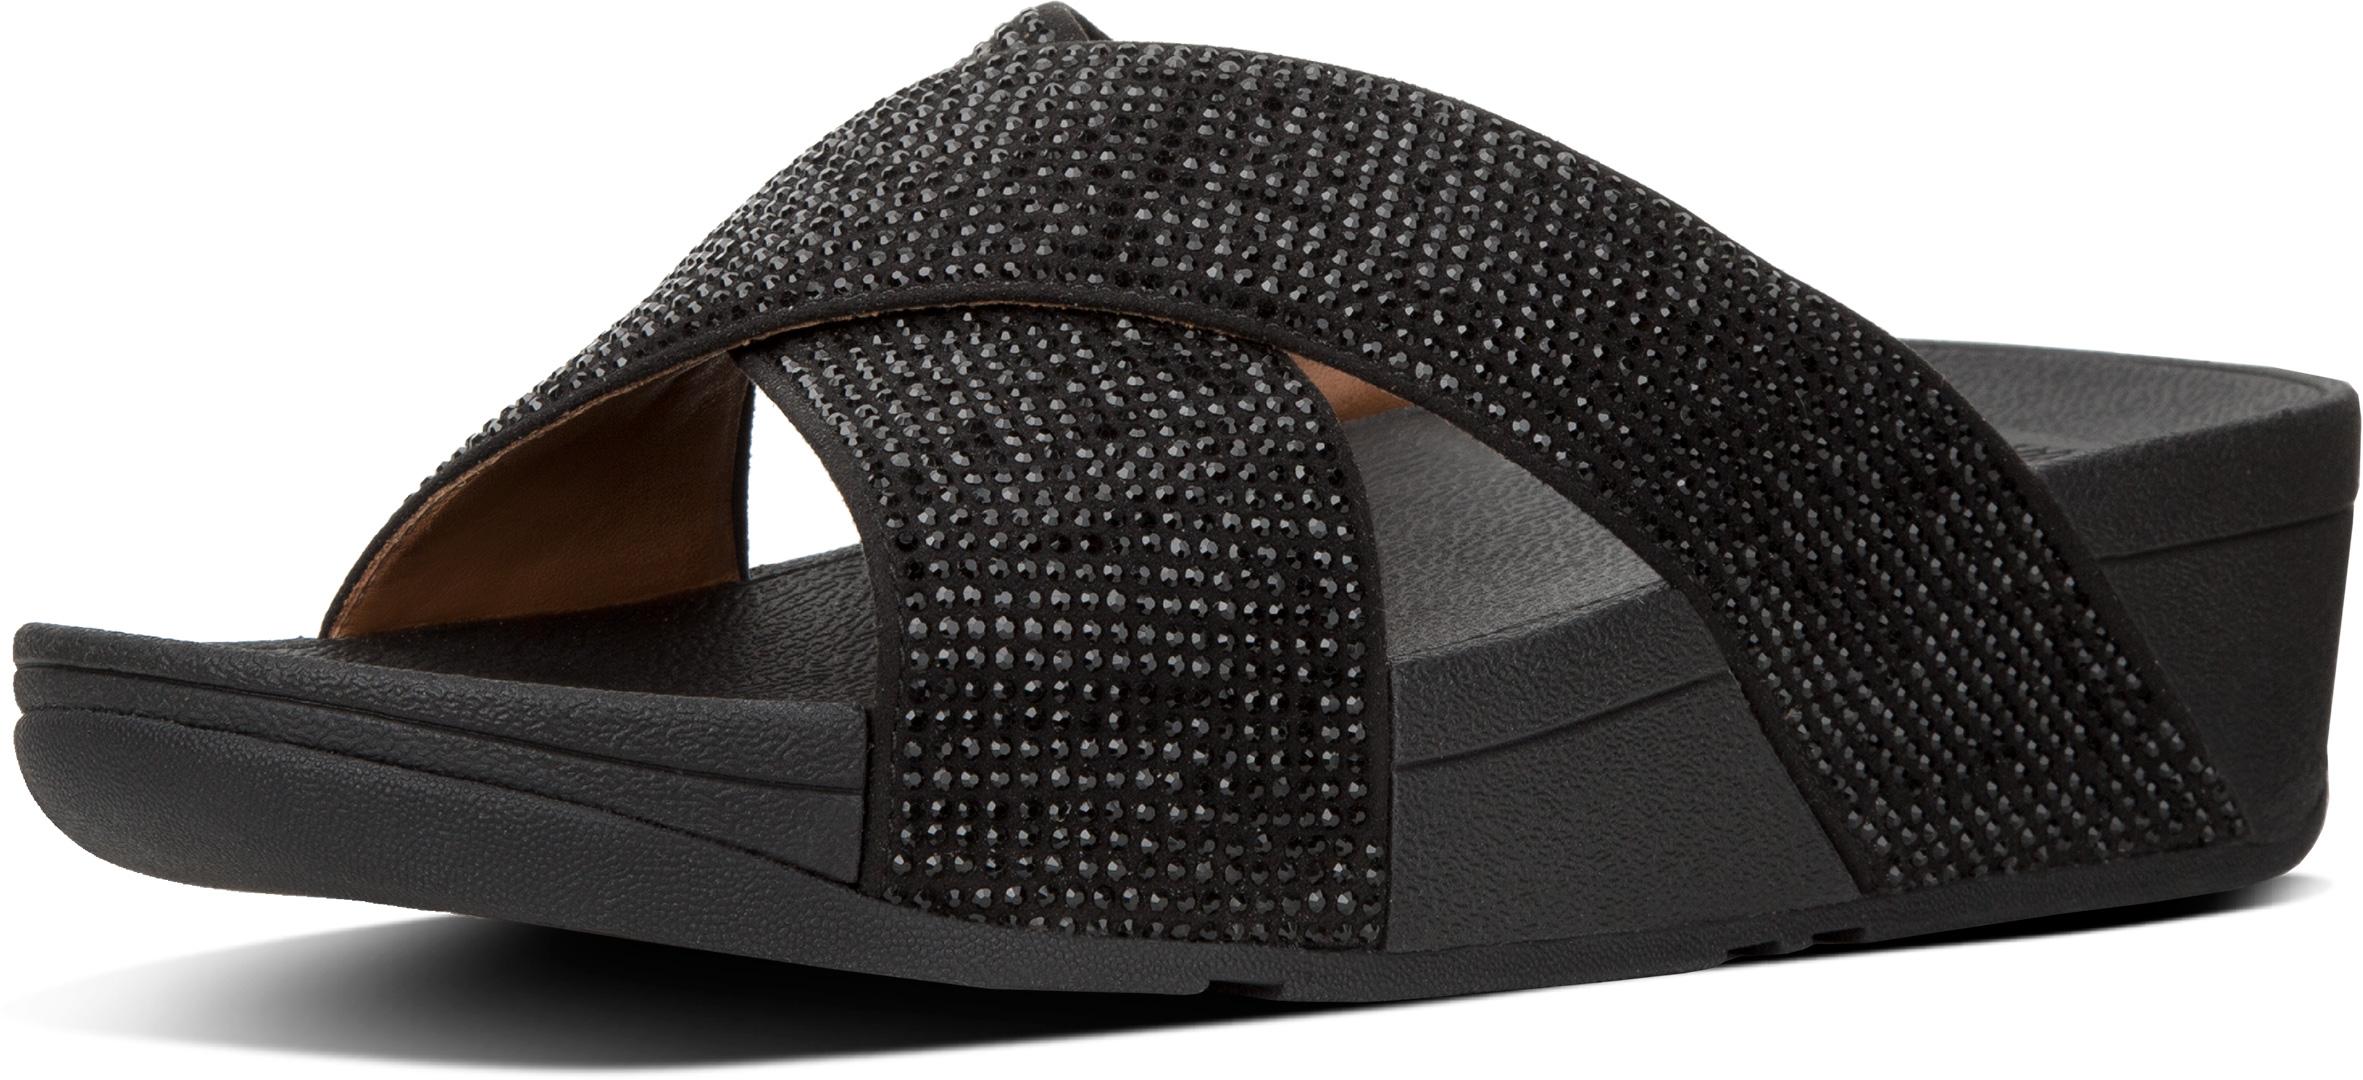 065559fb20ca Fitflop RITZY SLIDE Sandal 2018 black